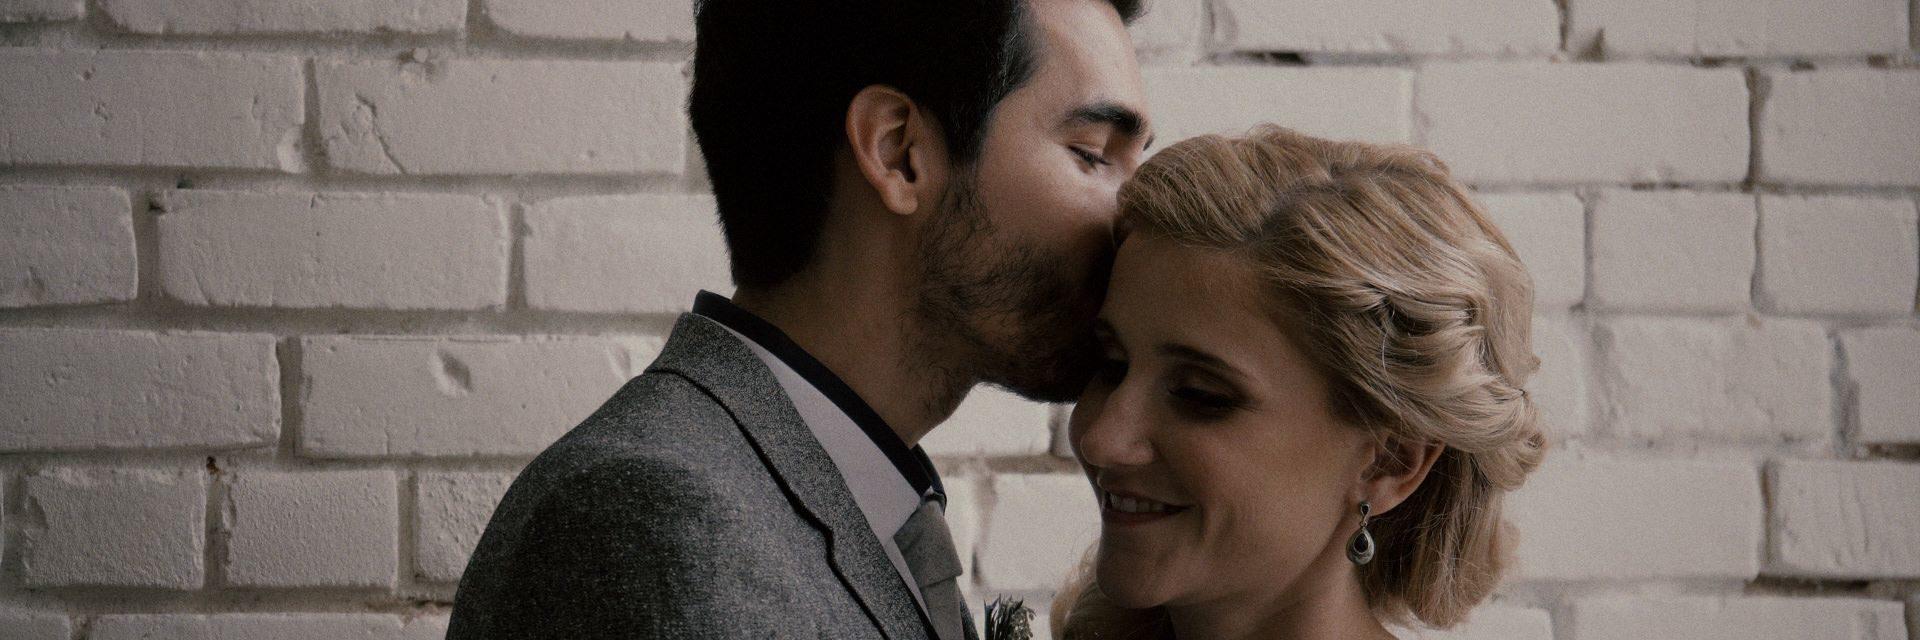 Noto-wedding-videographer-cinemate-films-03